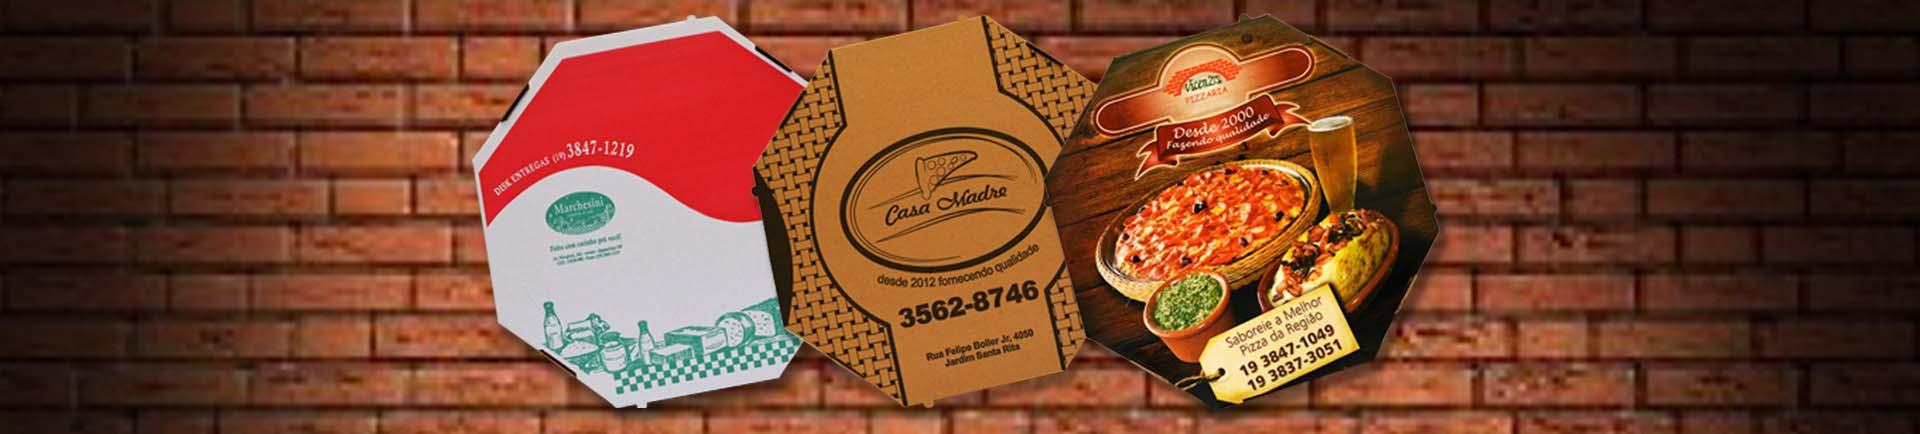 Fabrica caixa de pizza personalizada